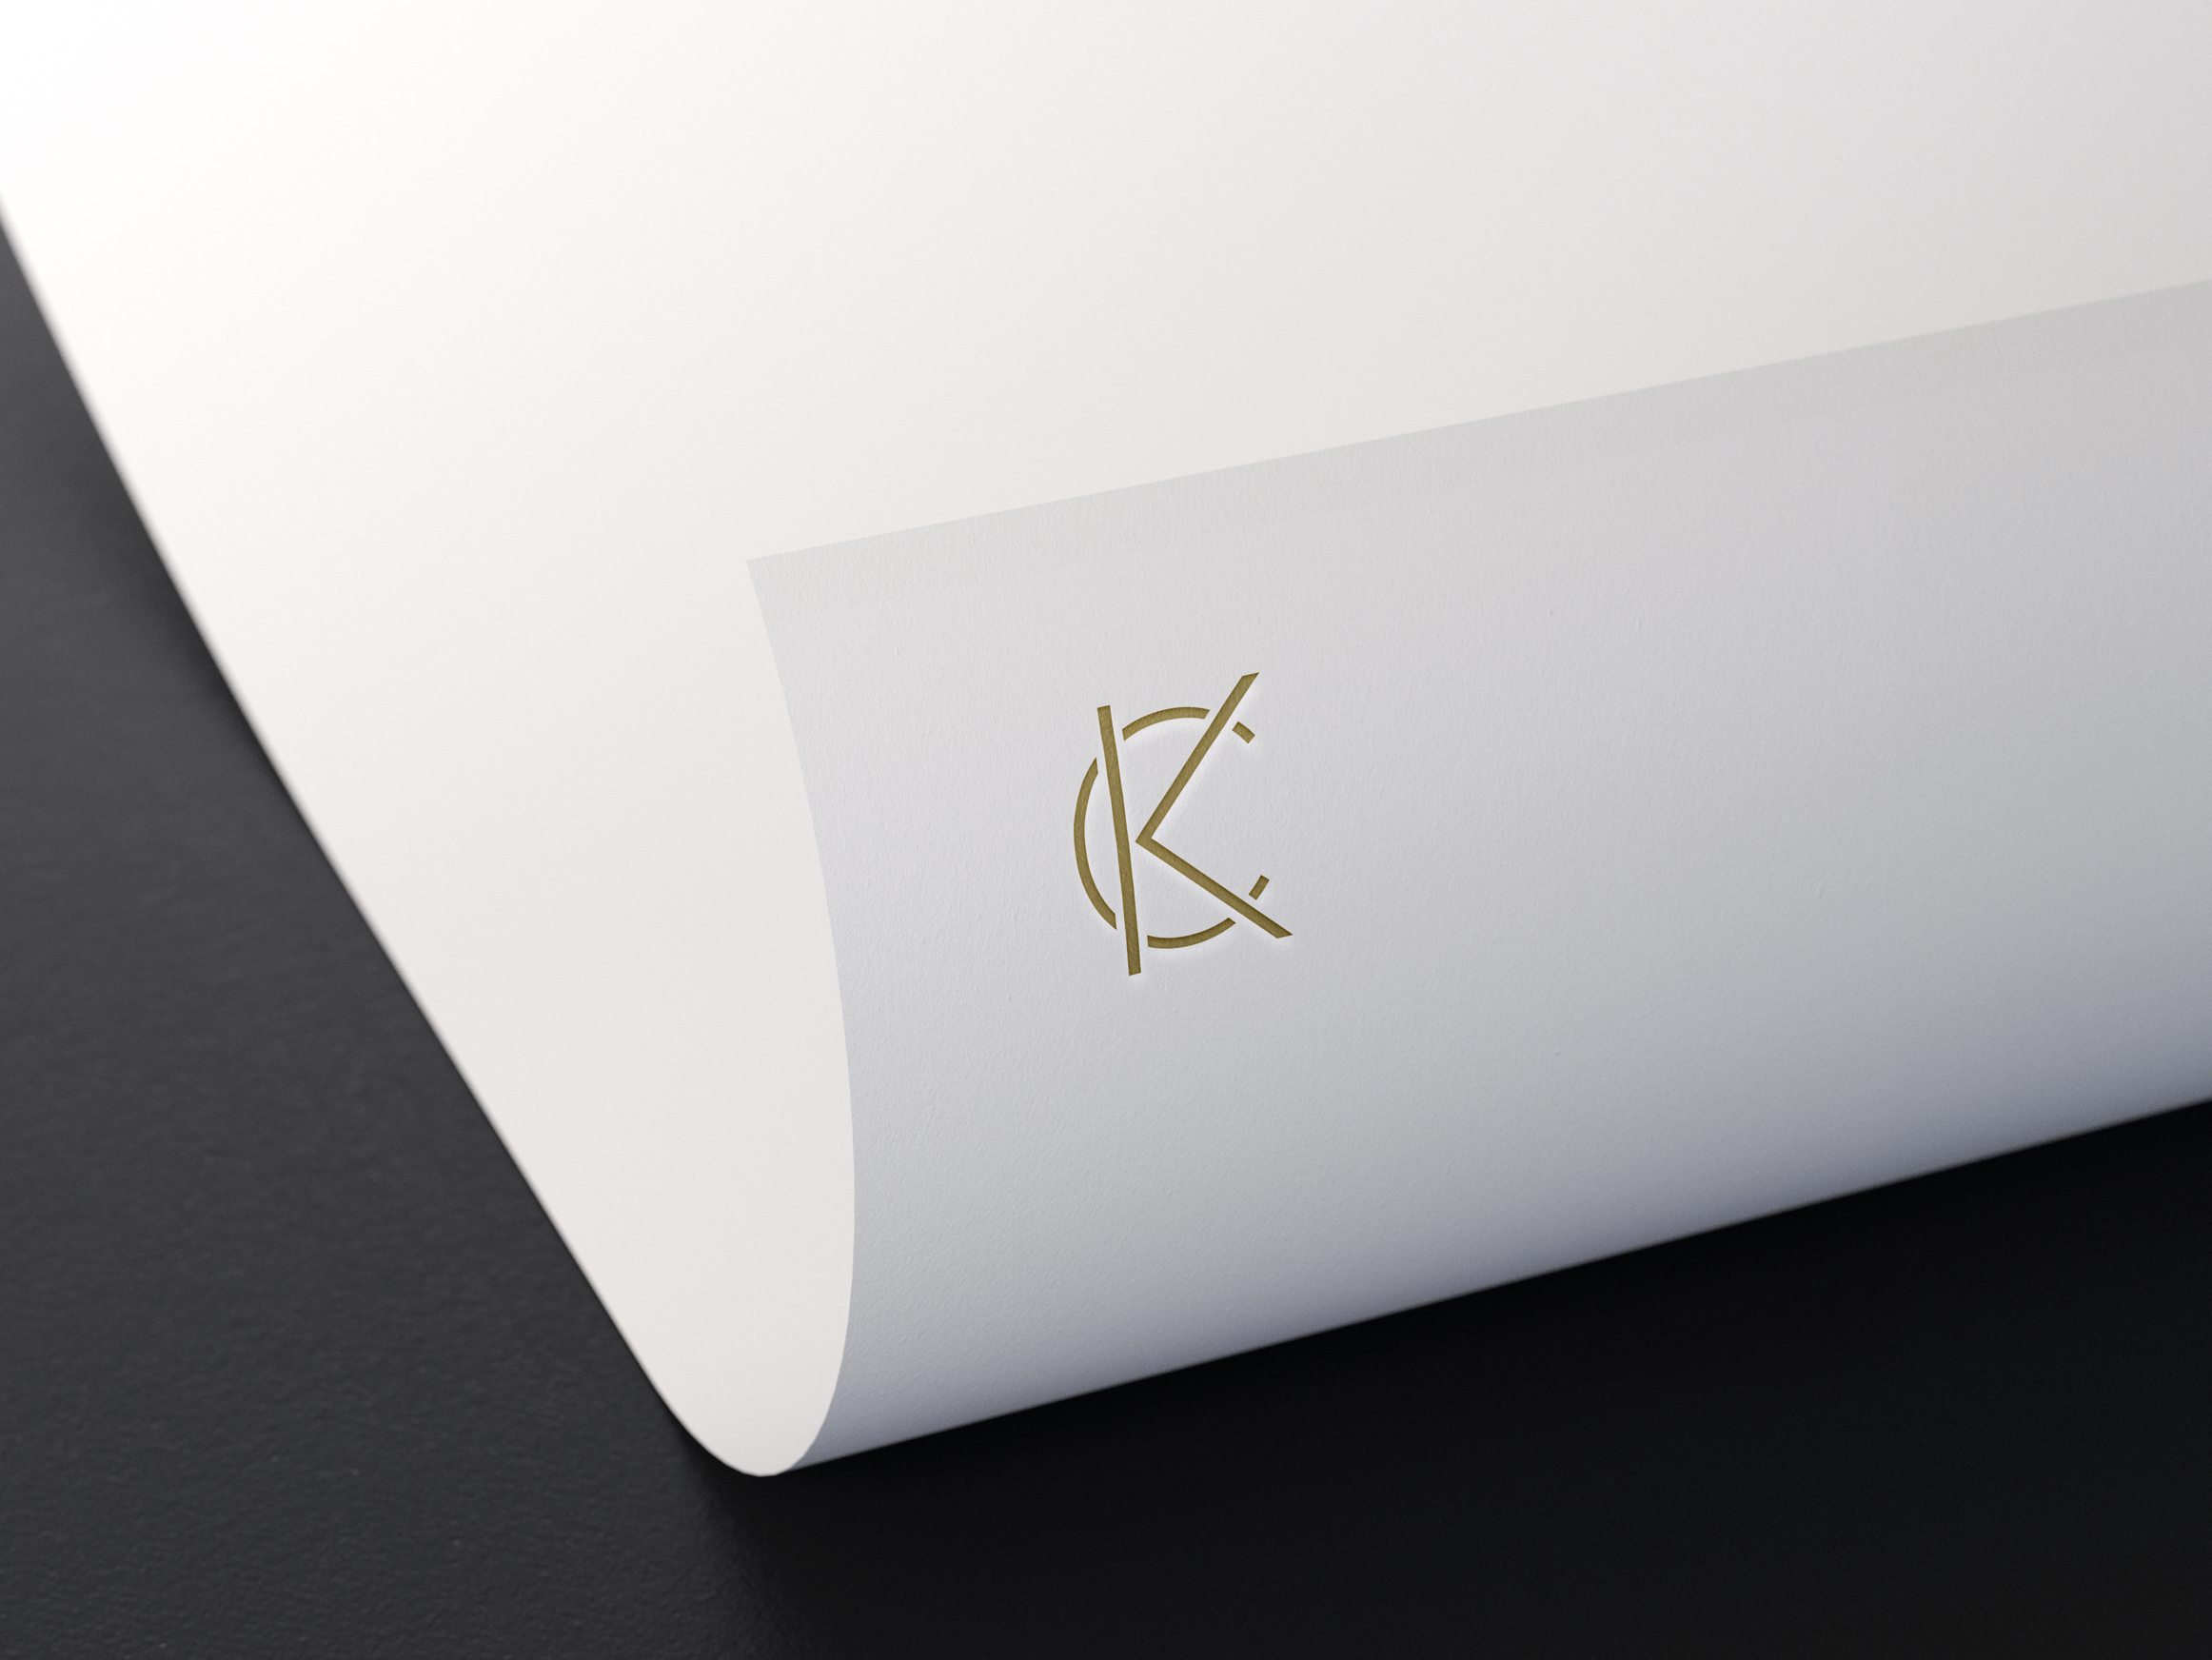 Kat & Co Brand